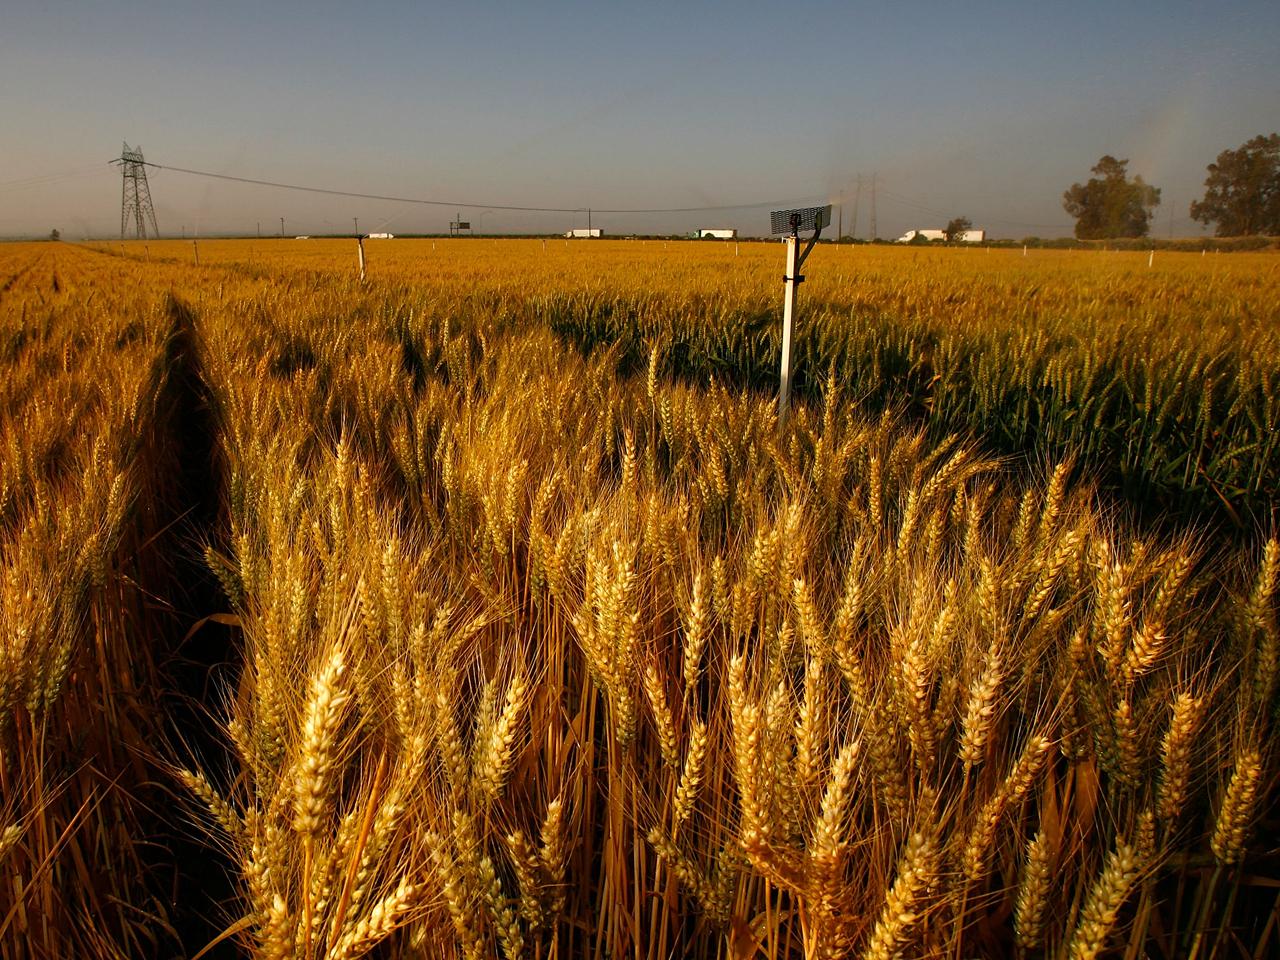 The Latest Updates on the 2018 Farm Bill – Farm Aid